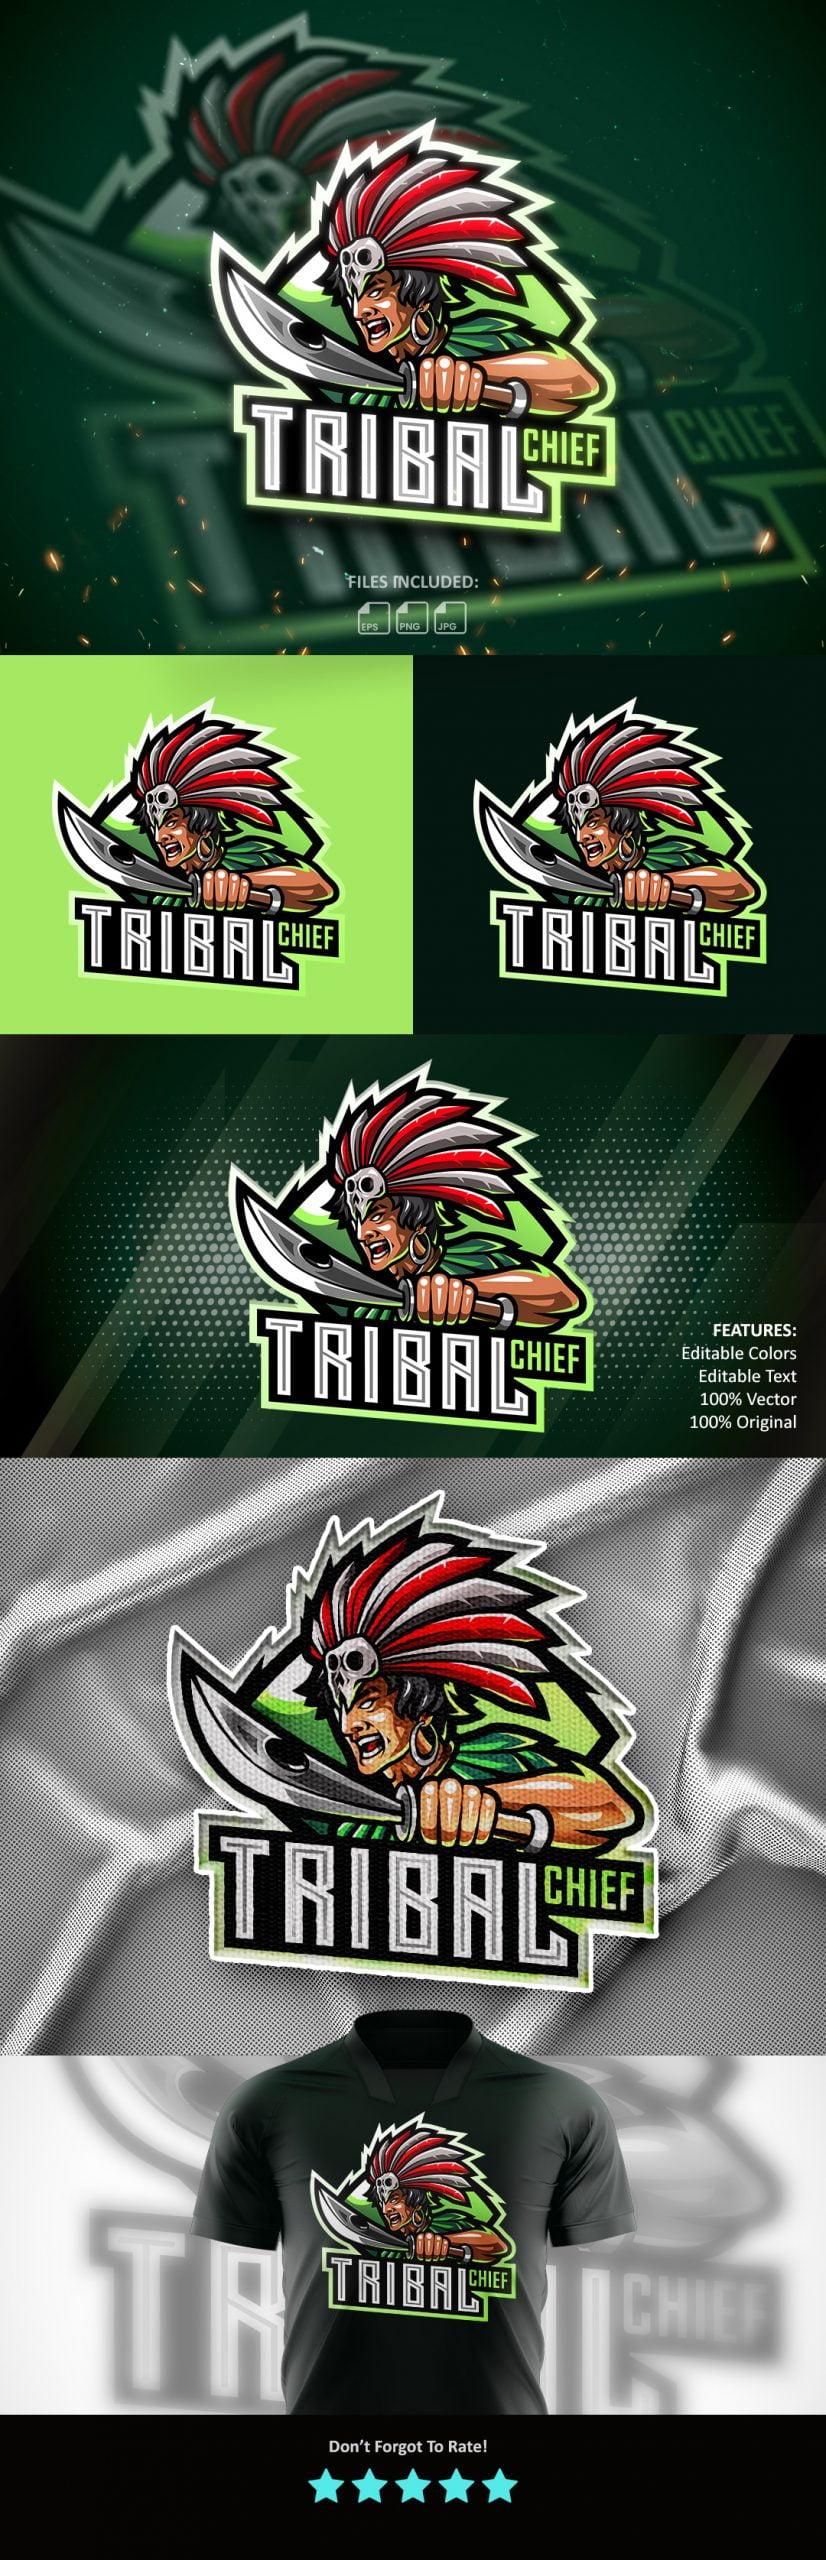 Free Tribal Chief Mascot Logo Template